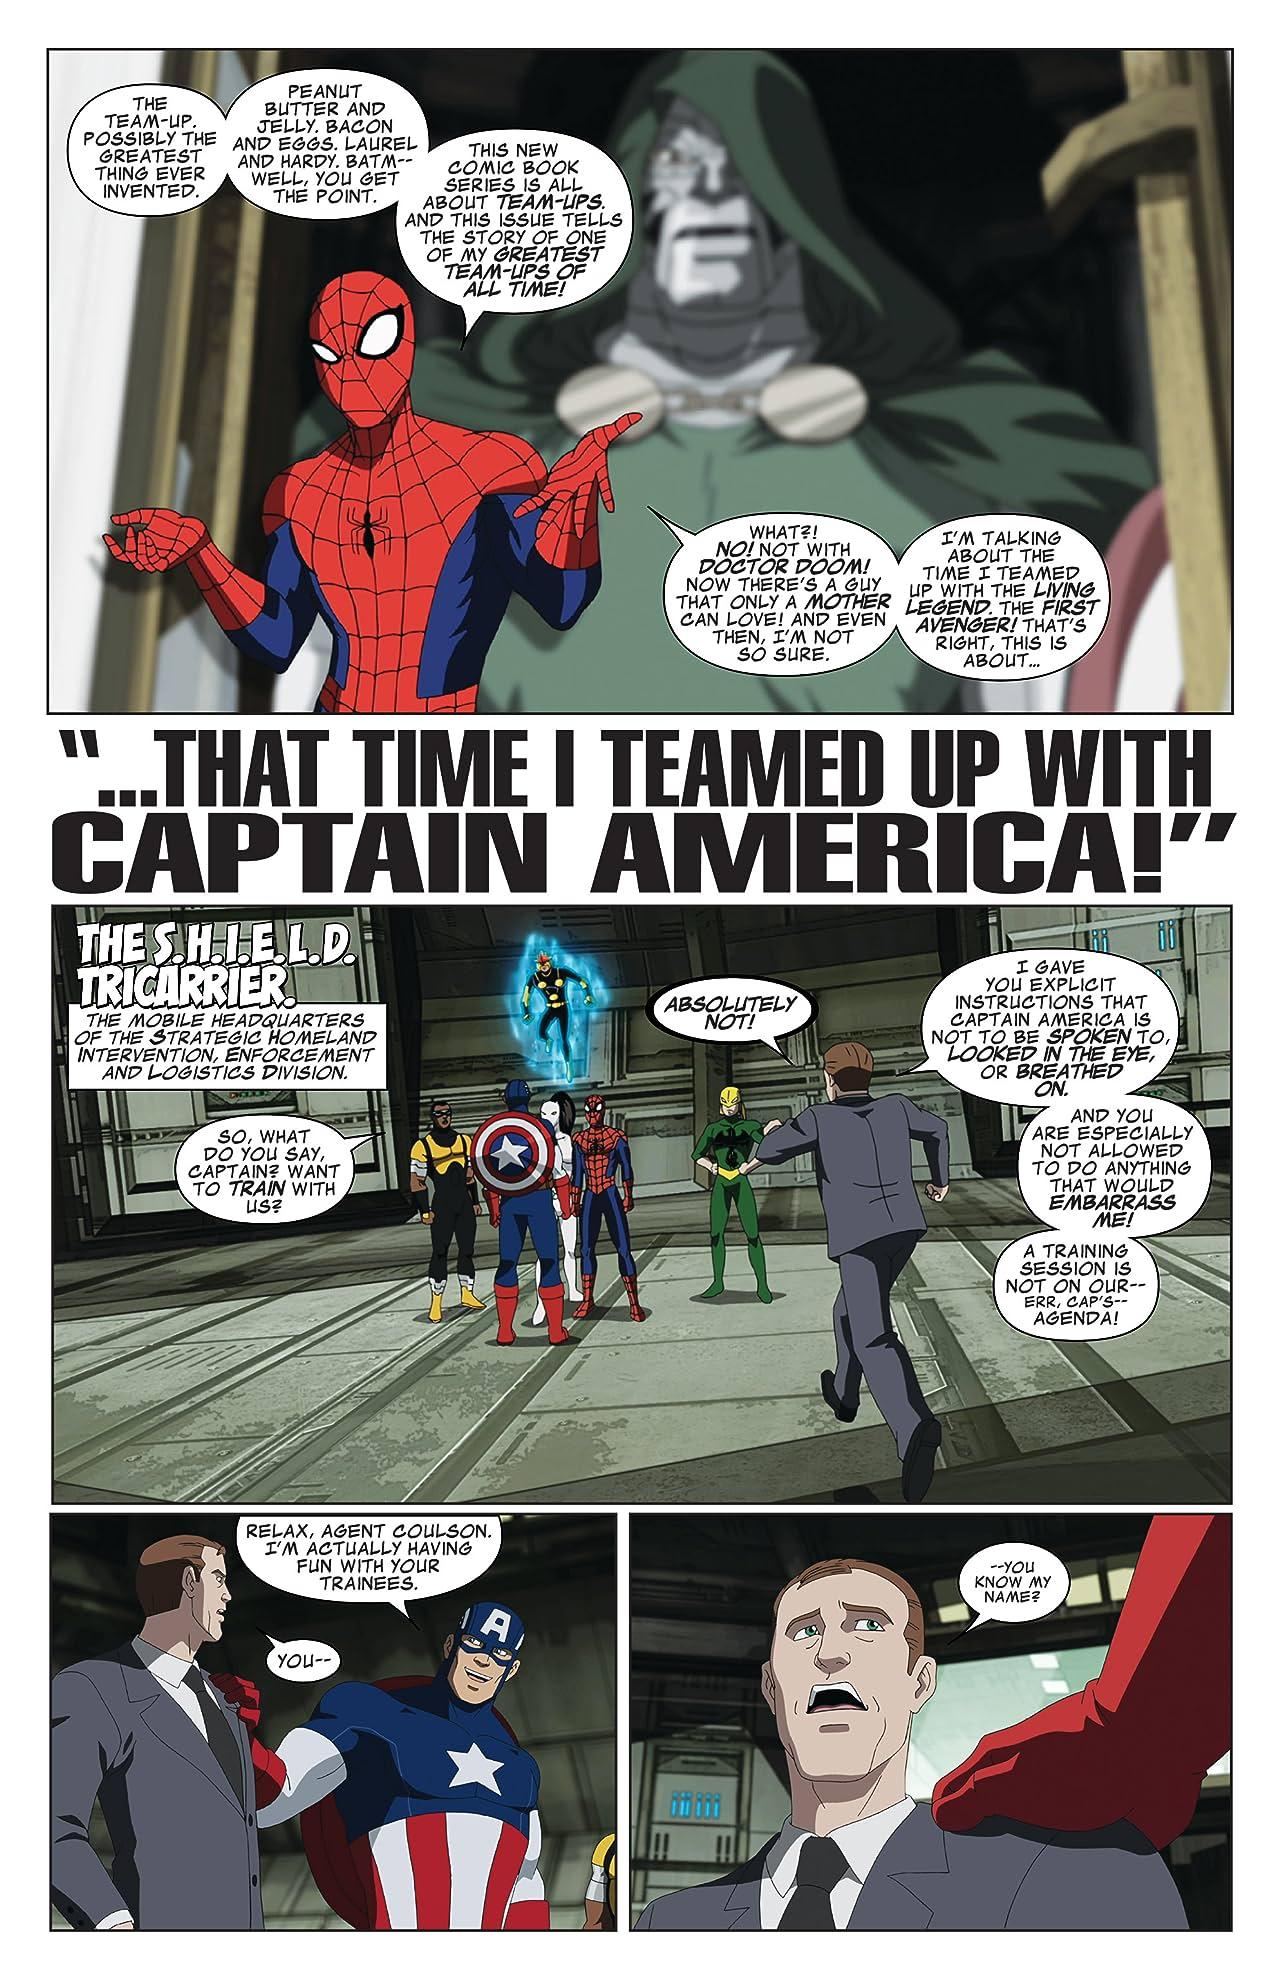 Marvel Universe Ultimate Spider-Man: Web Warriors (2014-2015) #1